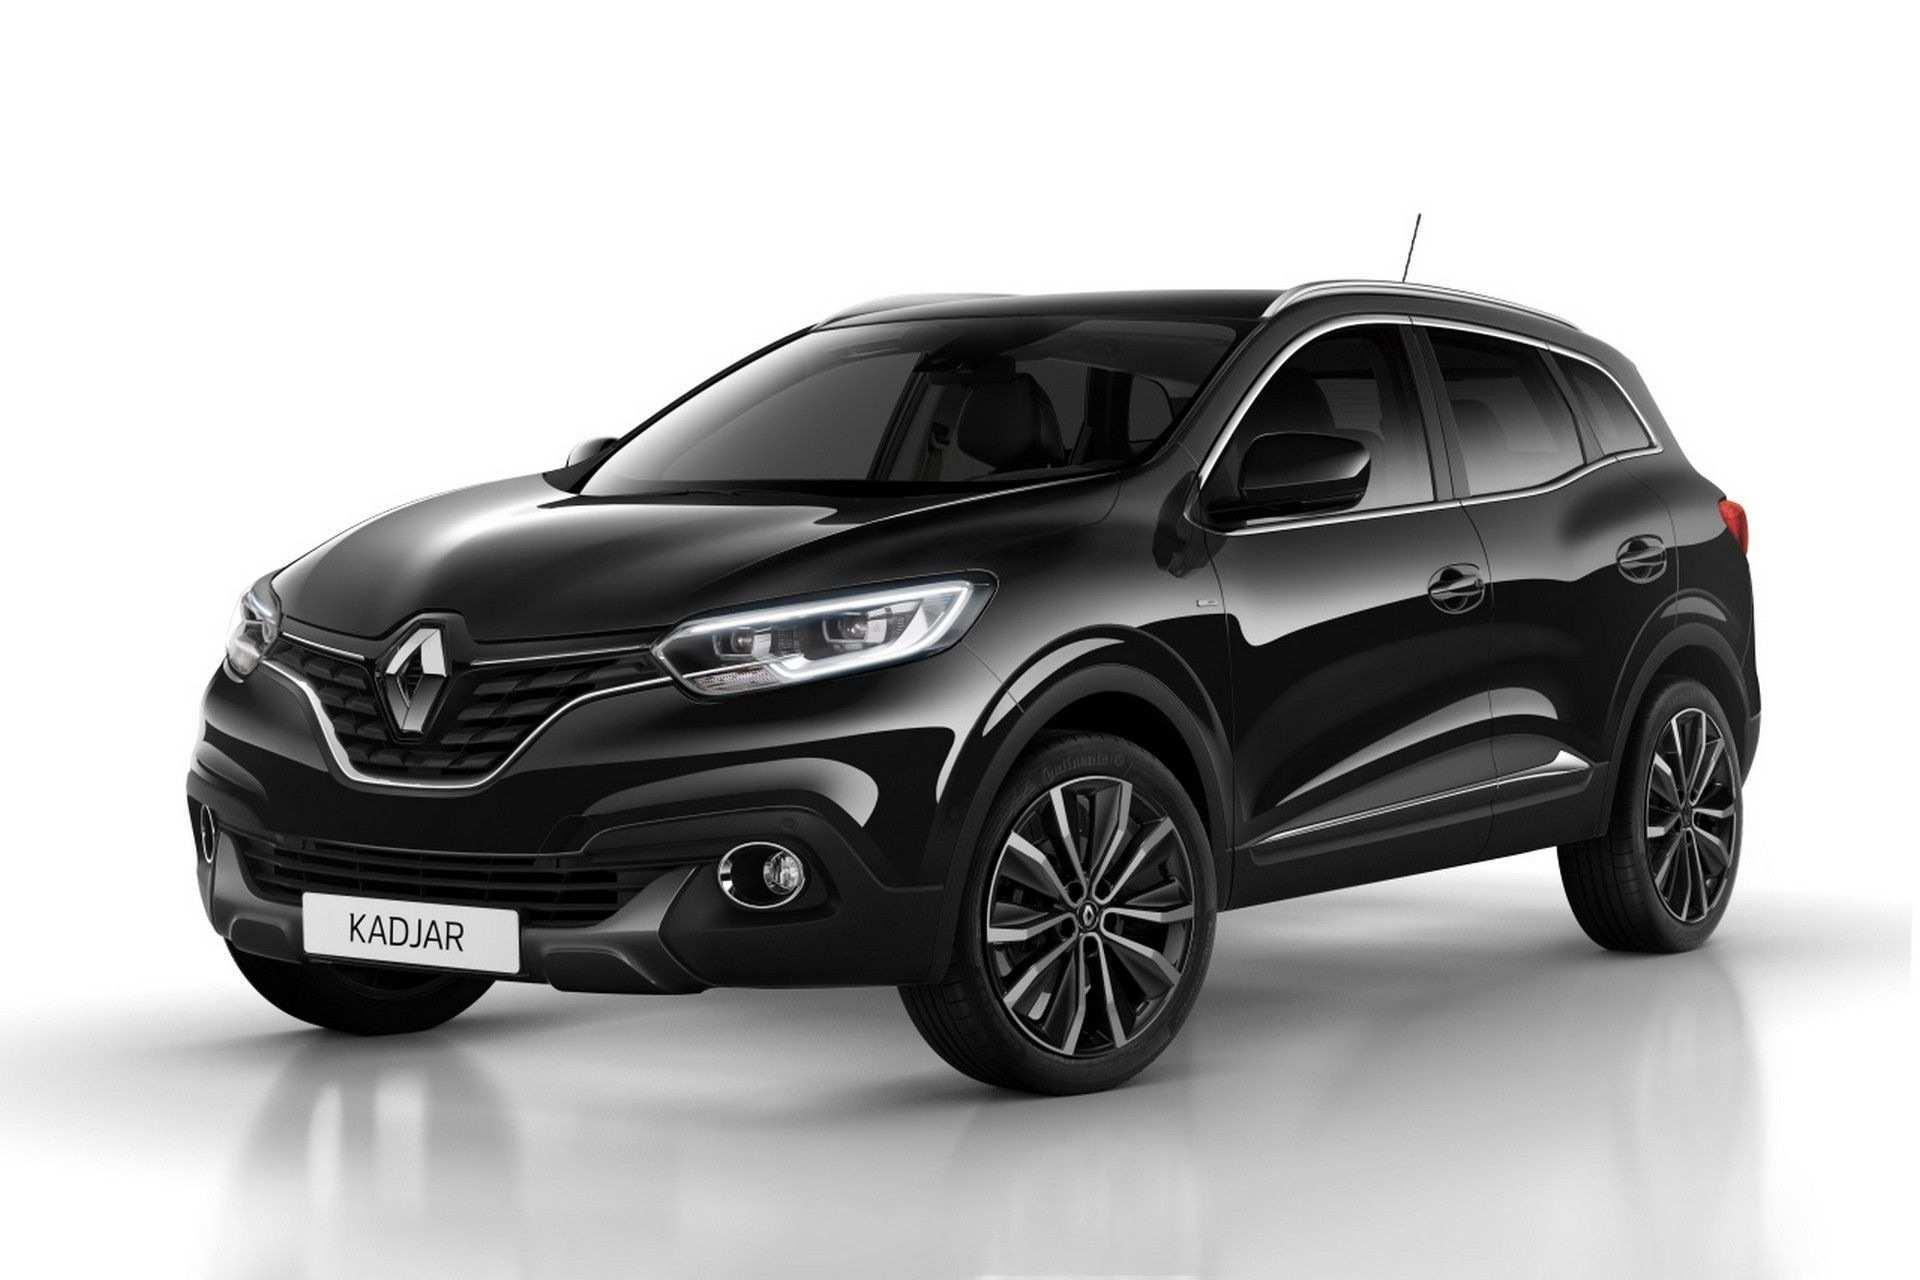 55 Best Review Renault Modelle 2020 Specs for Renault Modelle 2020